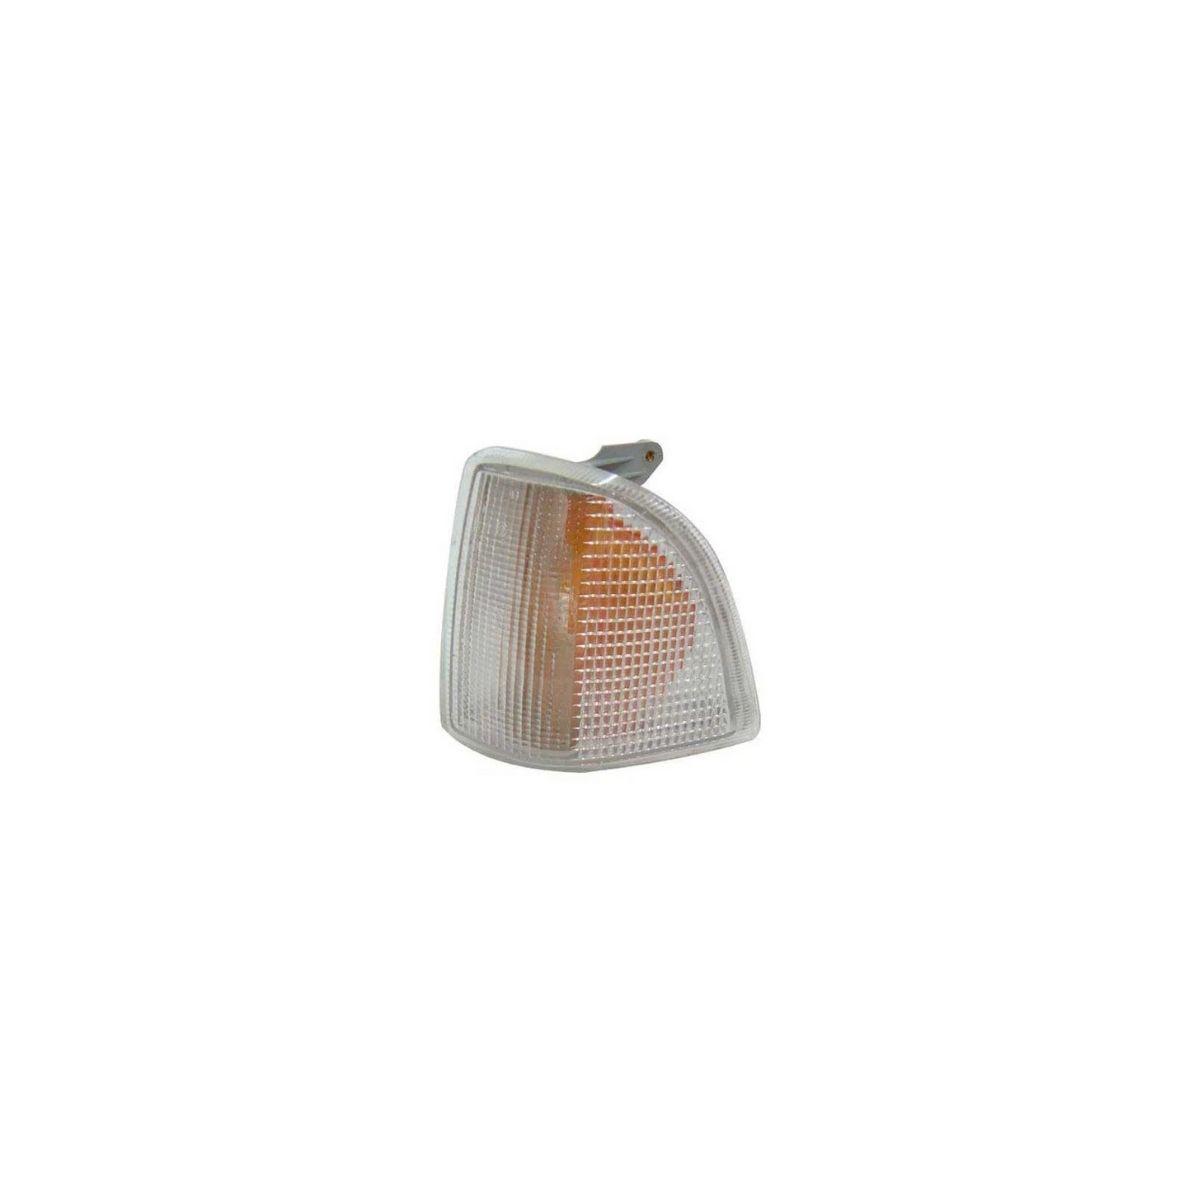 Lanterna Dianteira Esquerda Pampa Del Rey 85/ Cristal Arteb